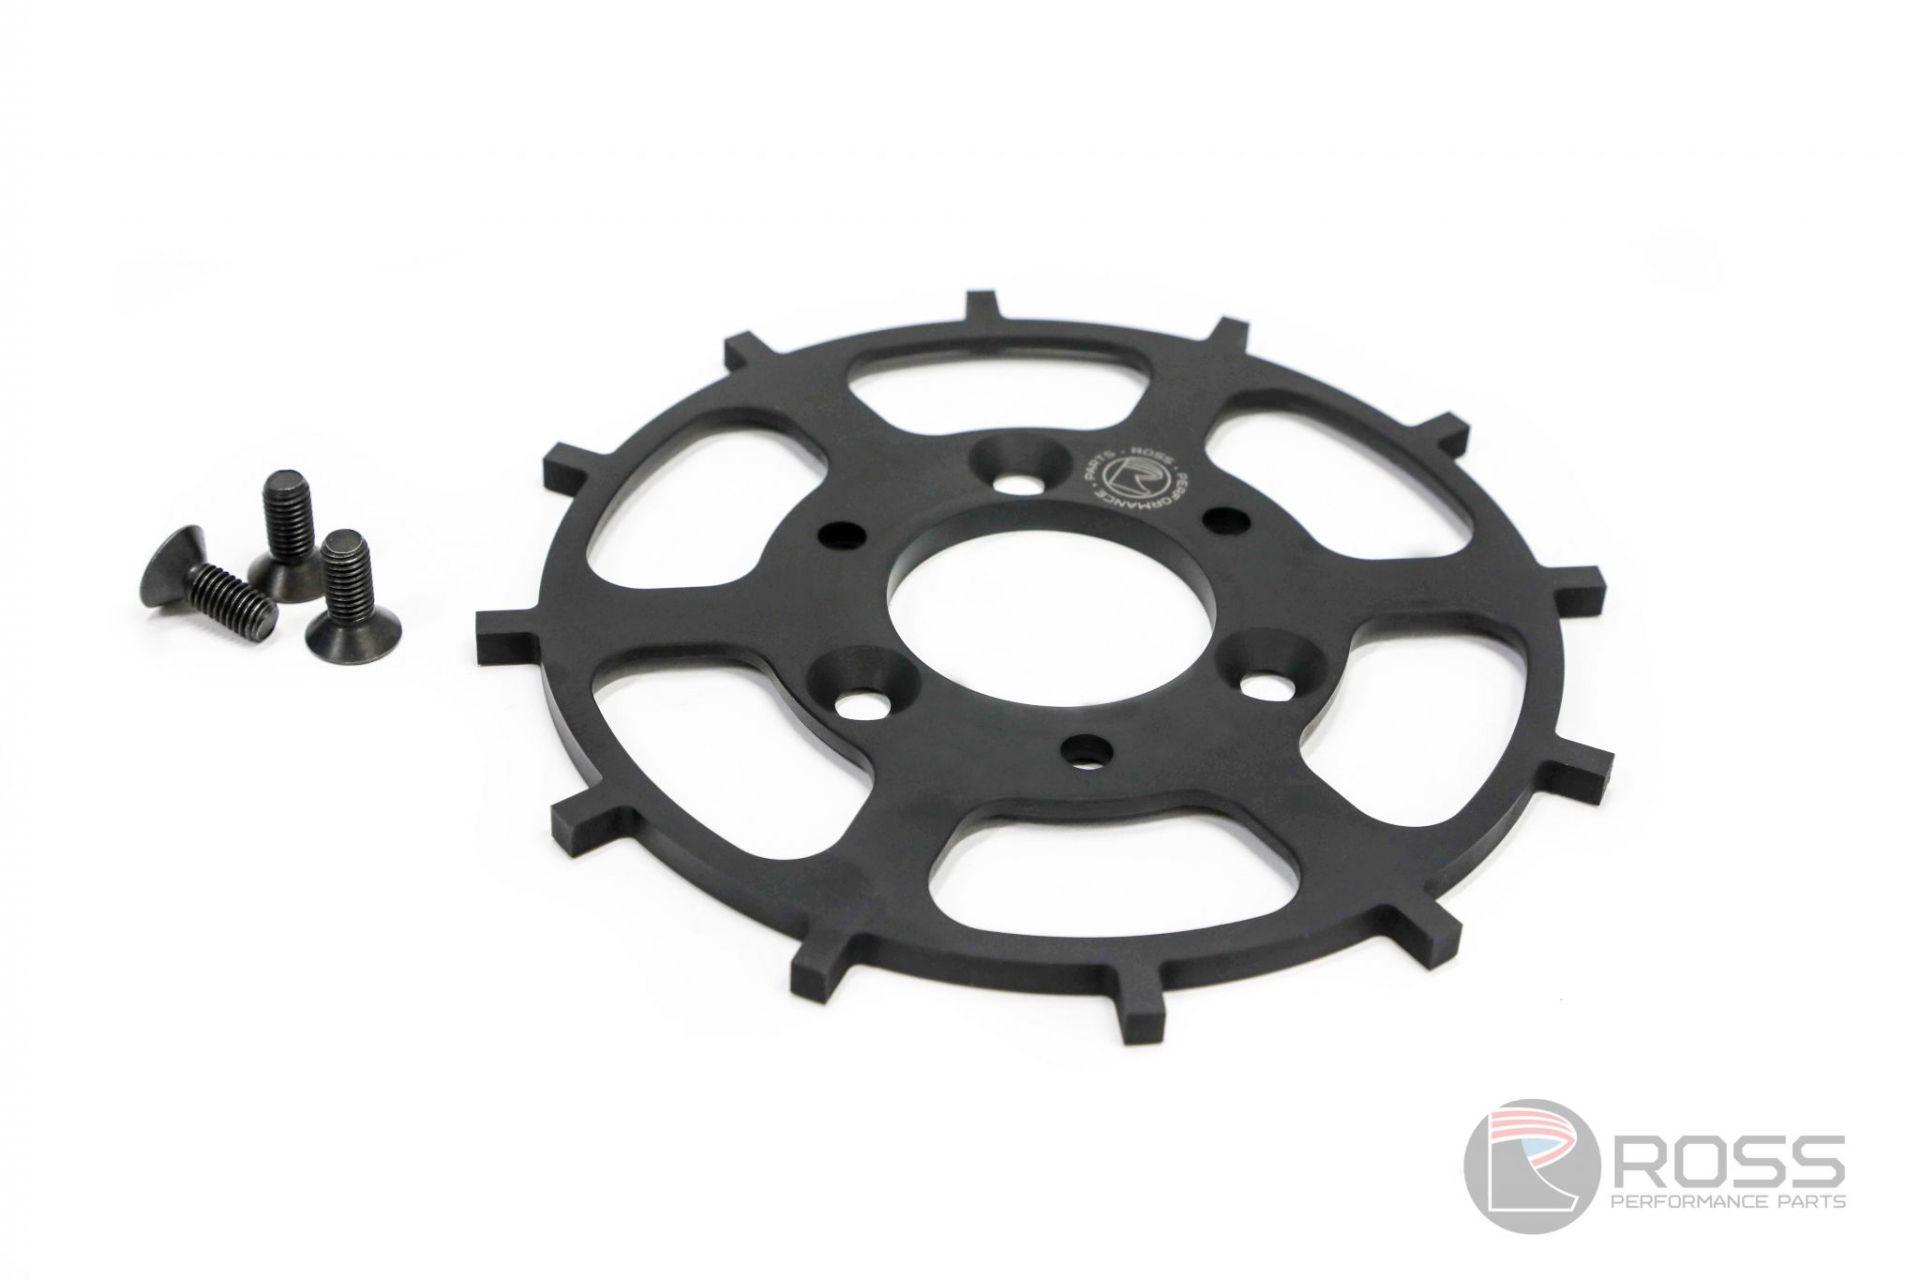 Nissan VK56 12T Crank Trigger Disc